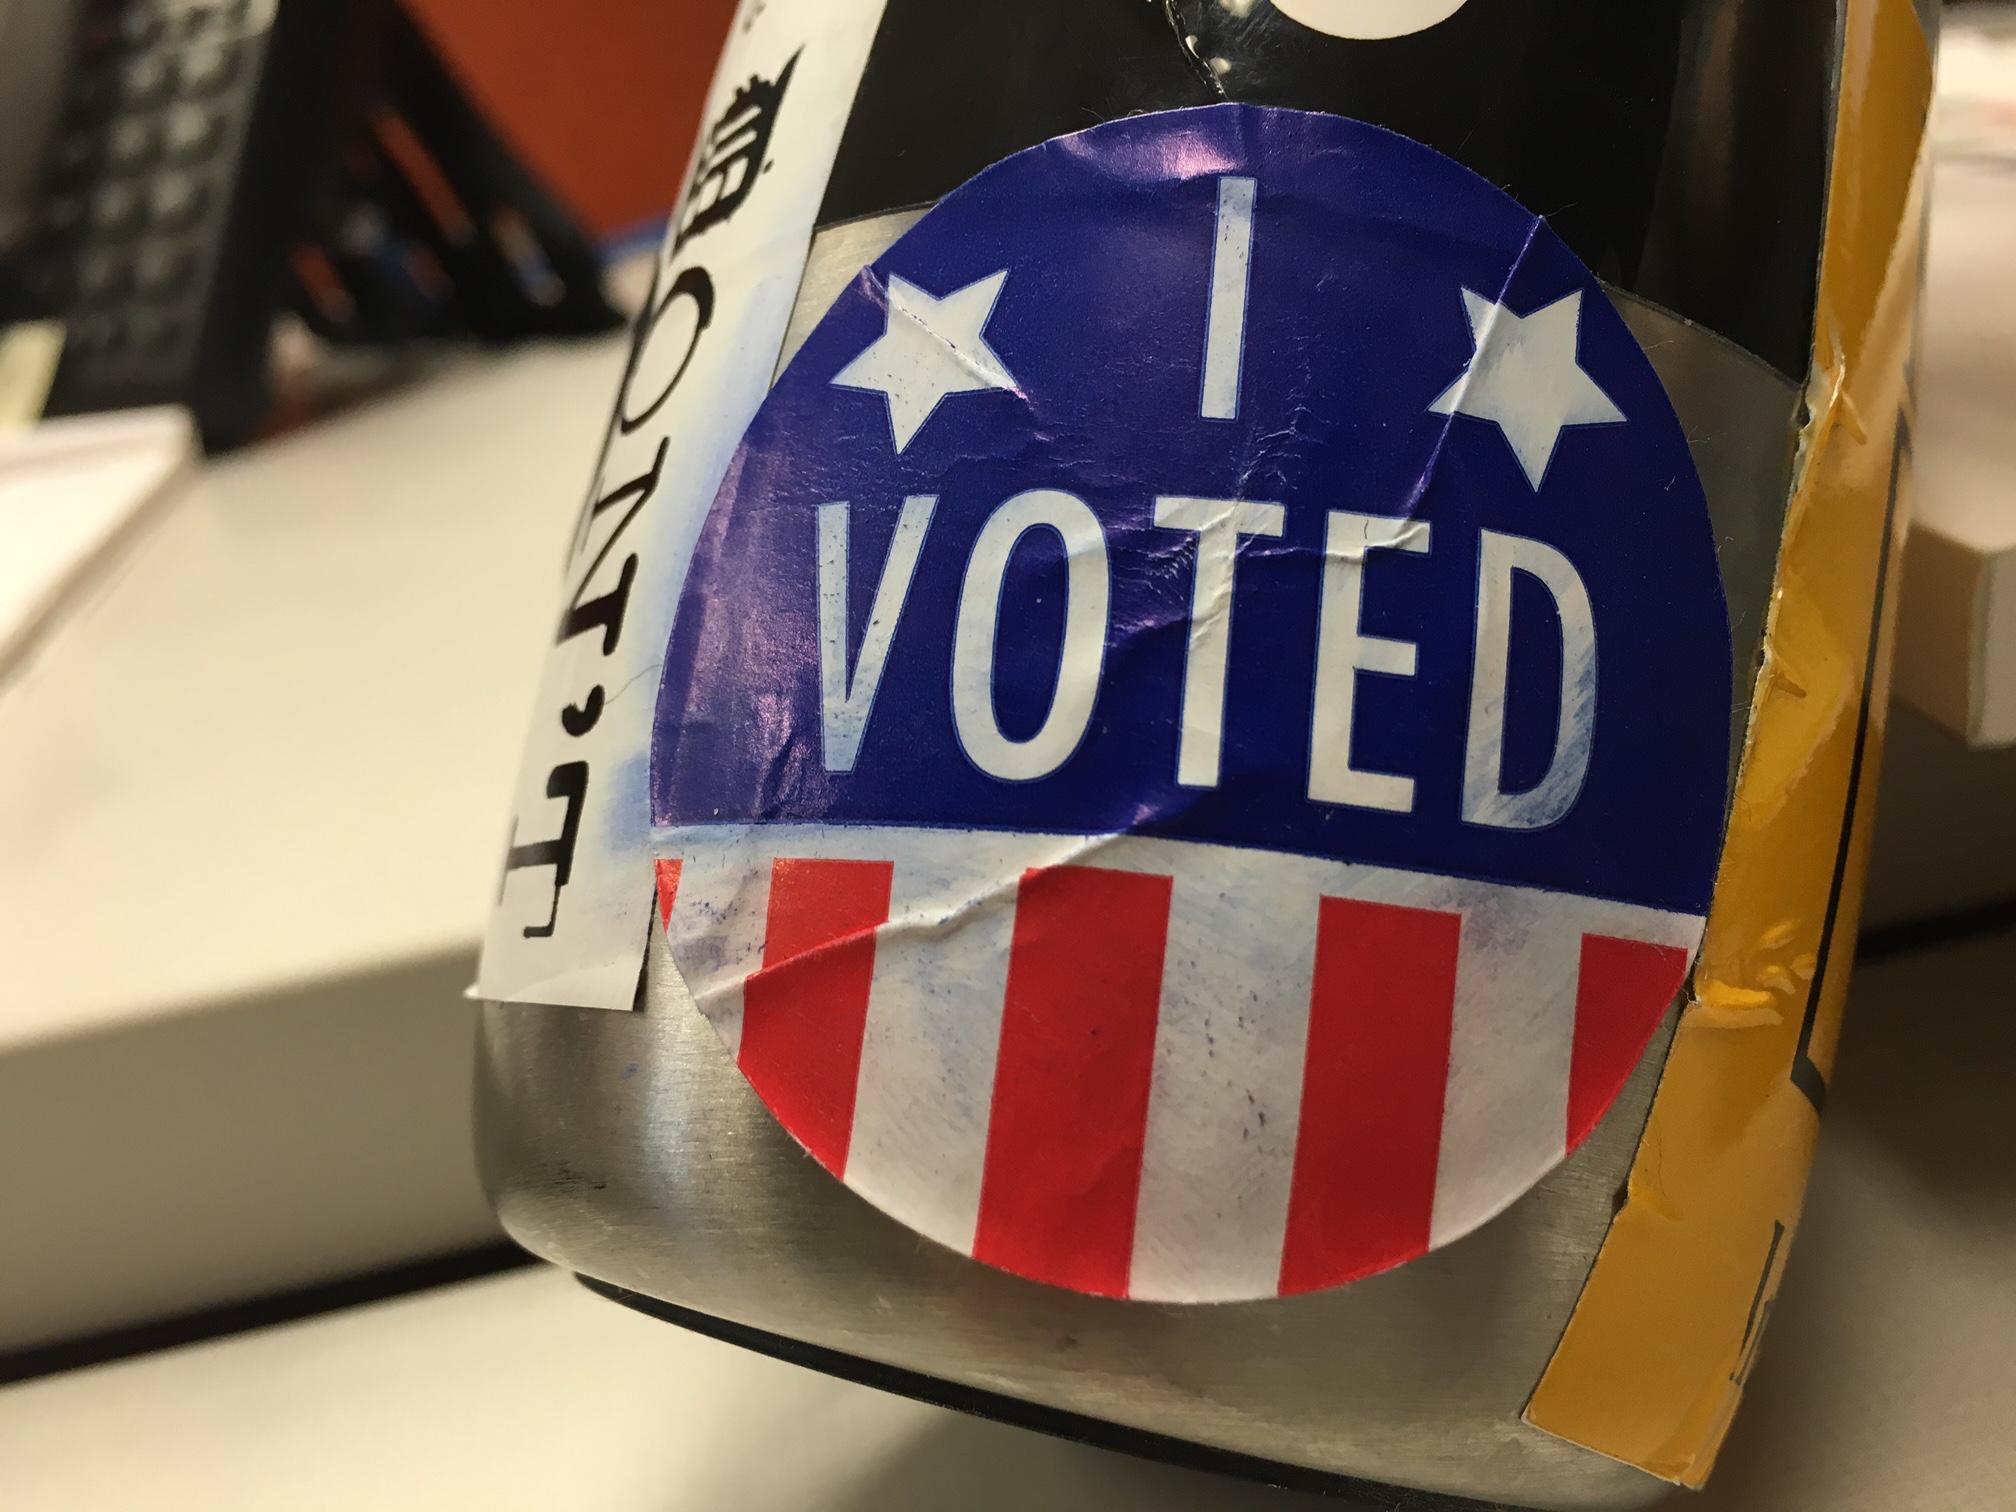 state elections bureau to investigate detroit ballot. Black Bedroom Furniture Sets. Home Design Ideas